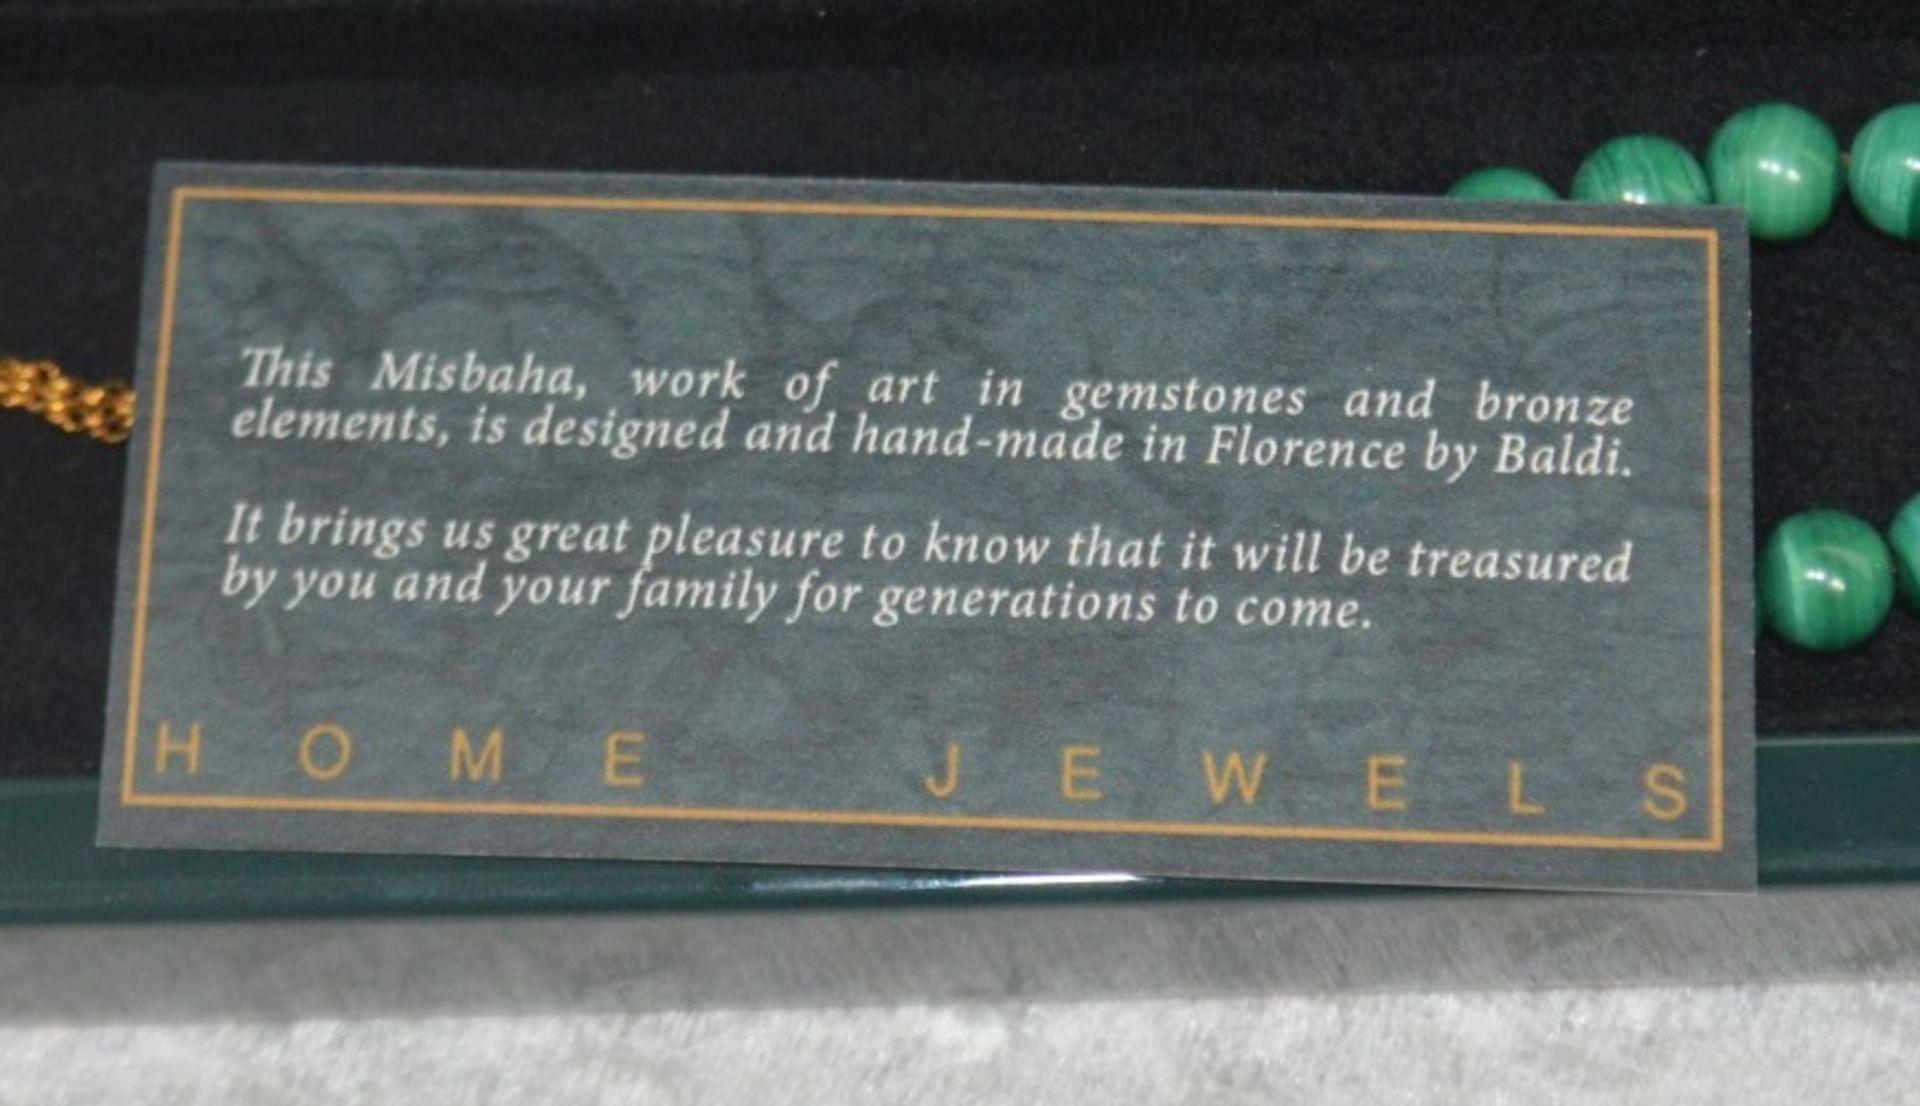 1 x BALDI 'Home Jewels' Italian Hand-crafted Artisan MISBAHA Prayer Beads In Green Malachite And - Image 5 of 5